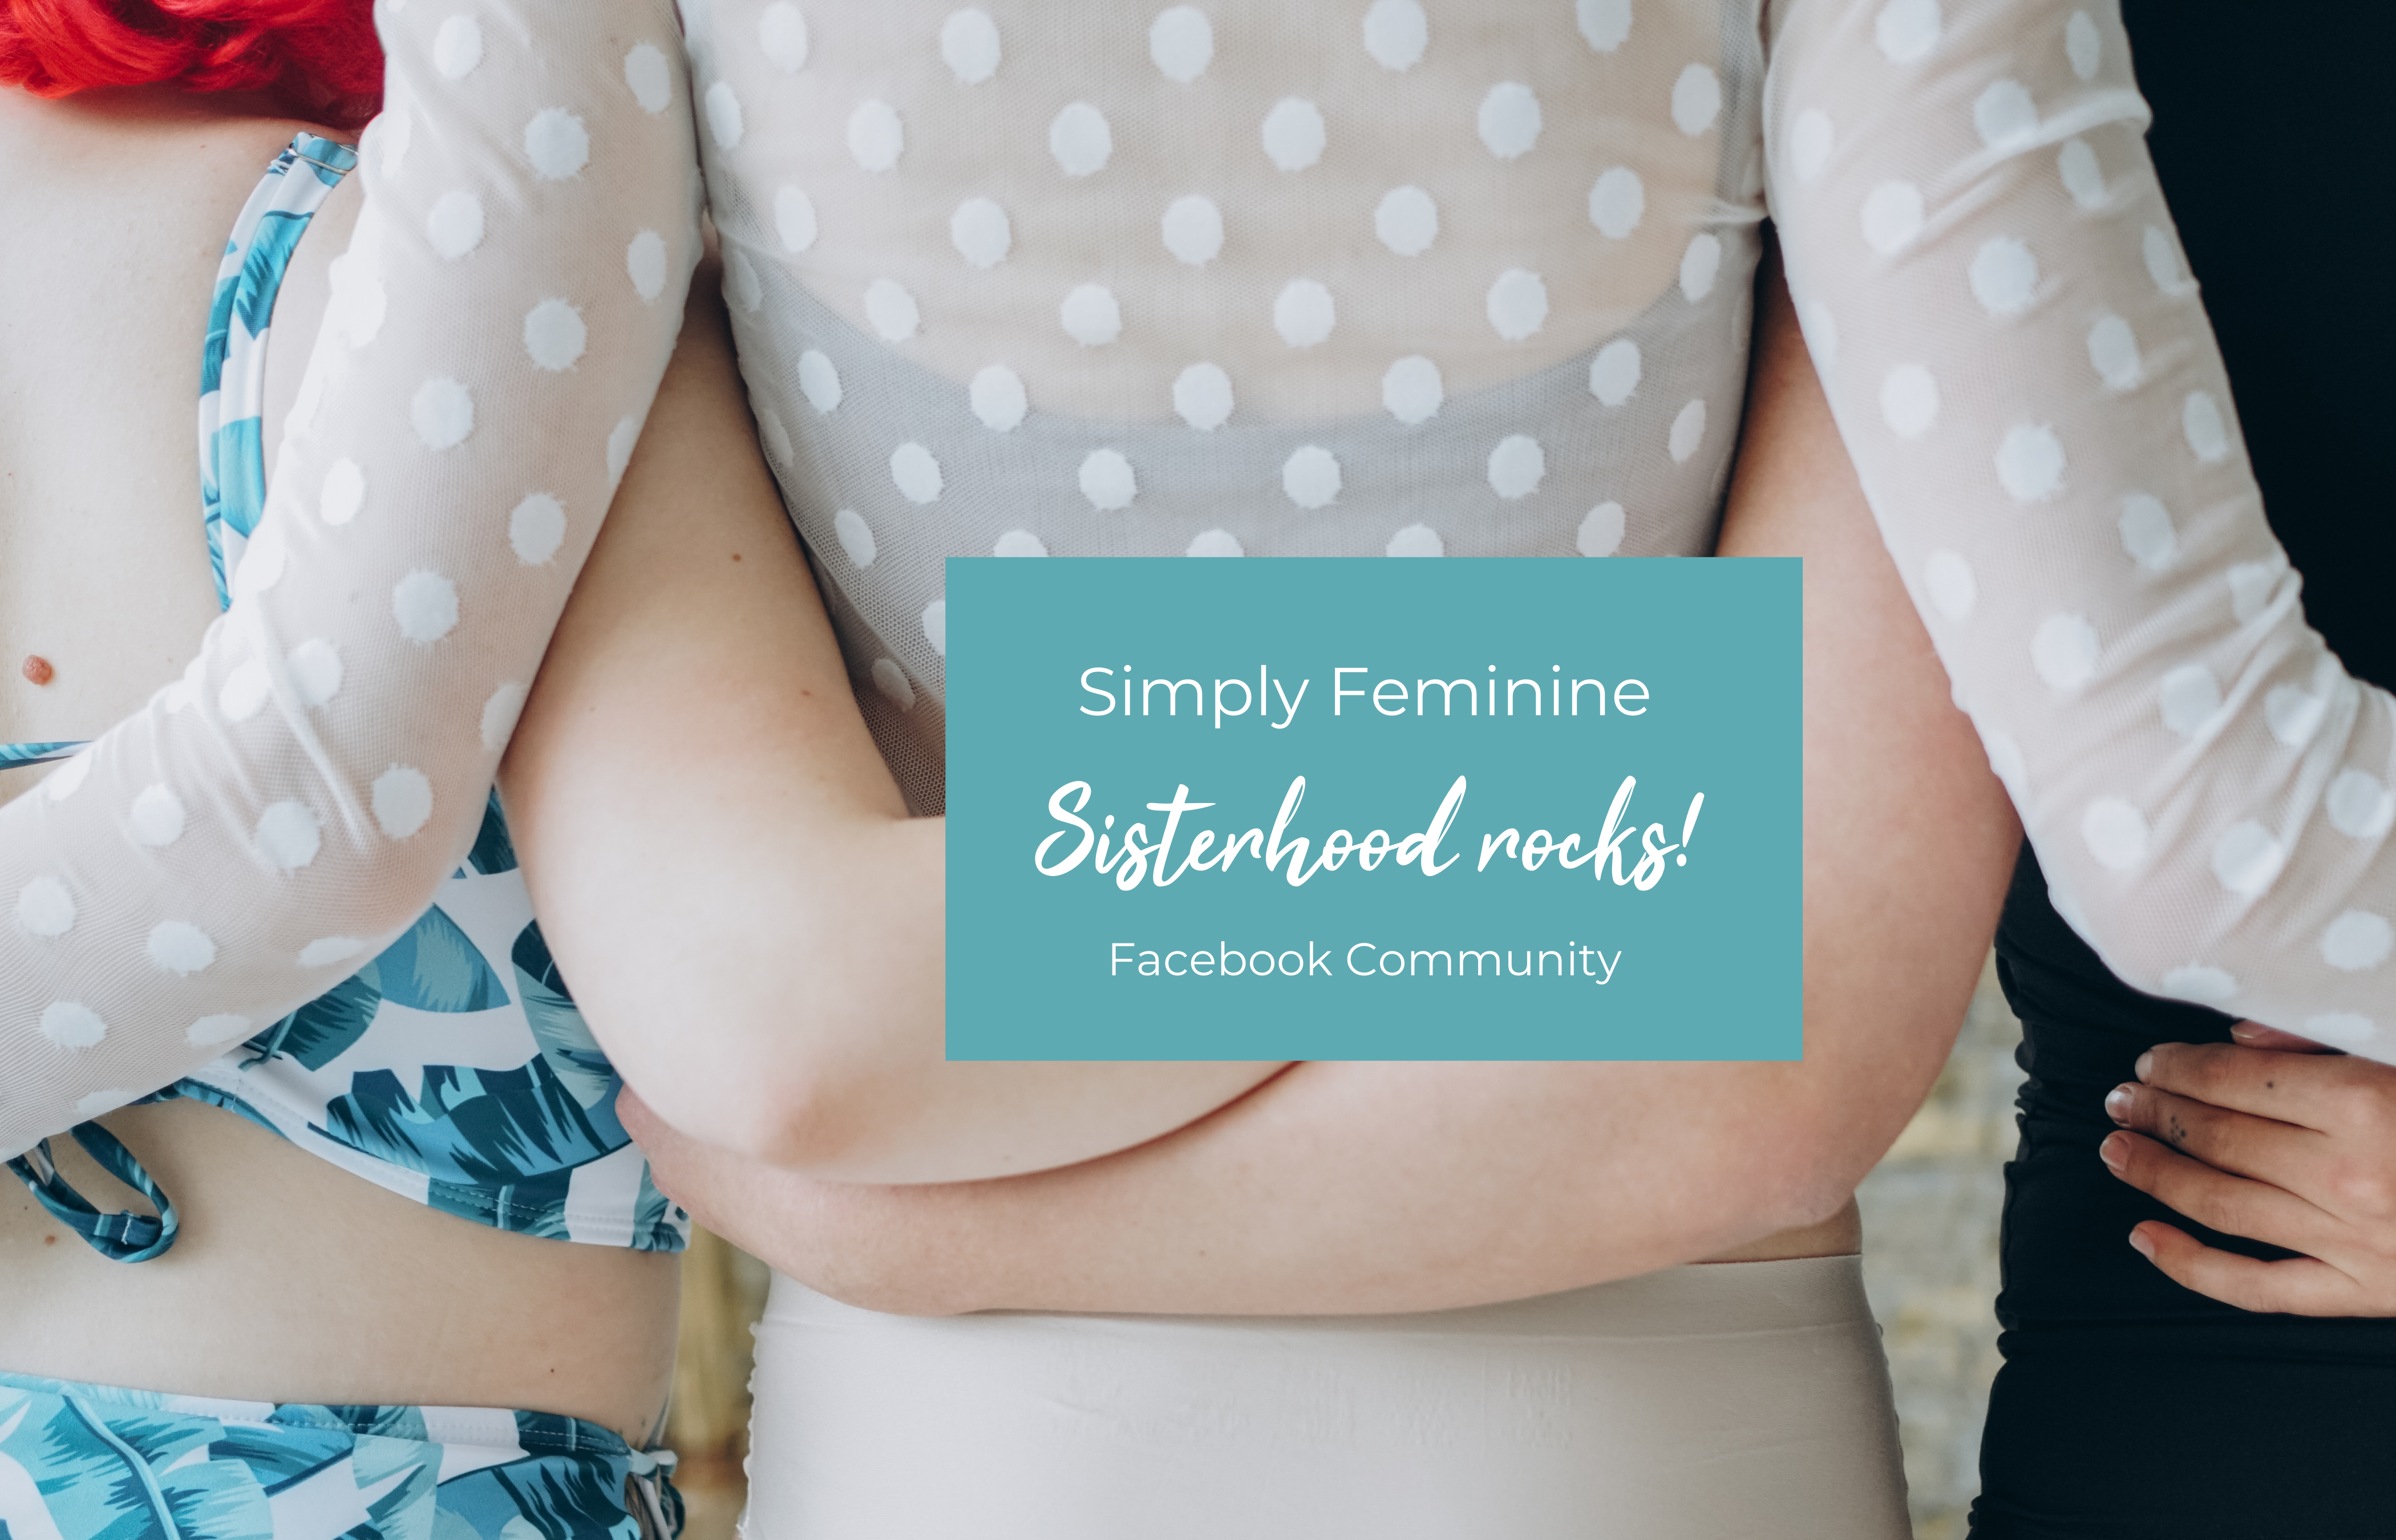 Simply Feminine - Sisterhood Community